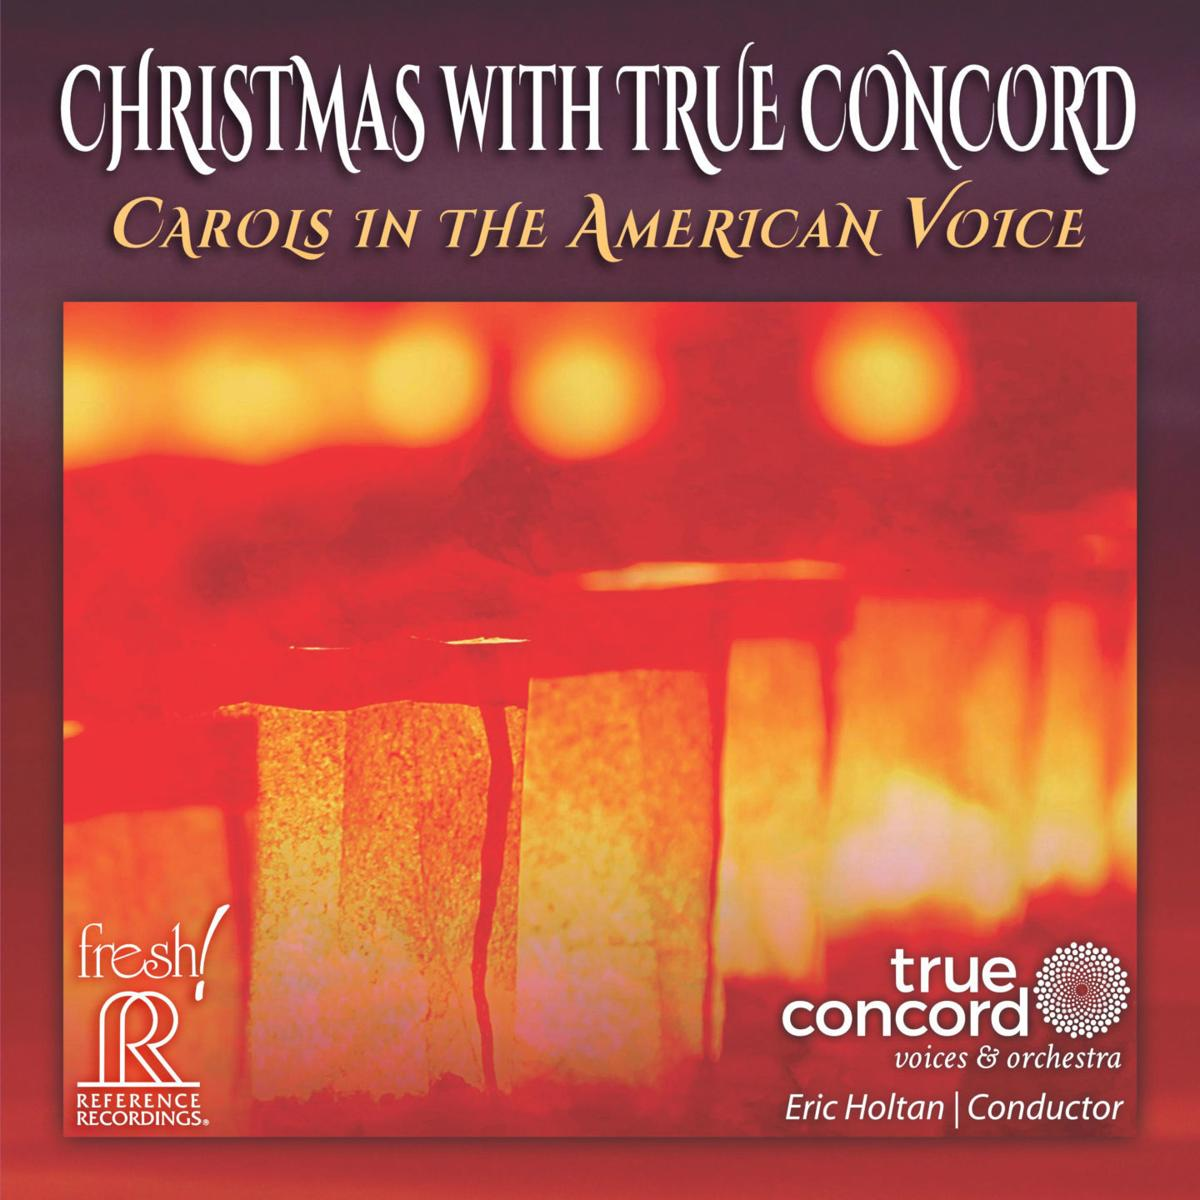 Christmas Services 2020 Tucson.Com True Concord releasing Christmas album | Music | tucson.com